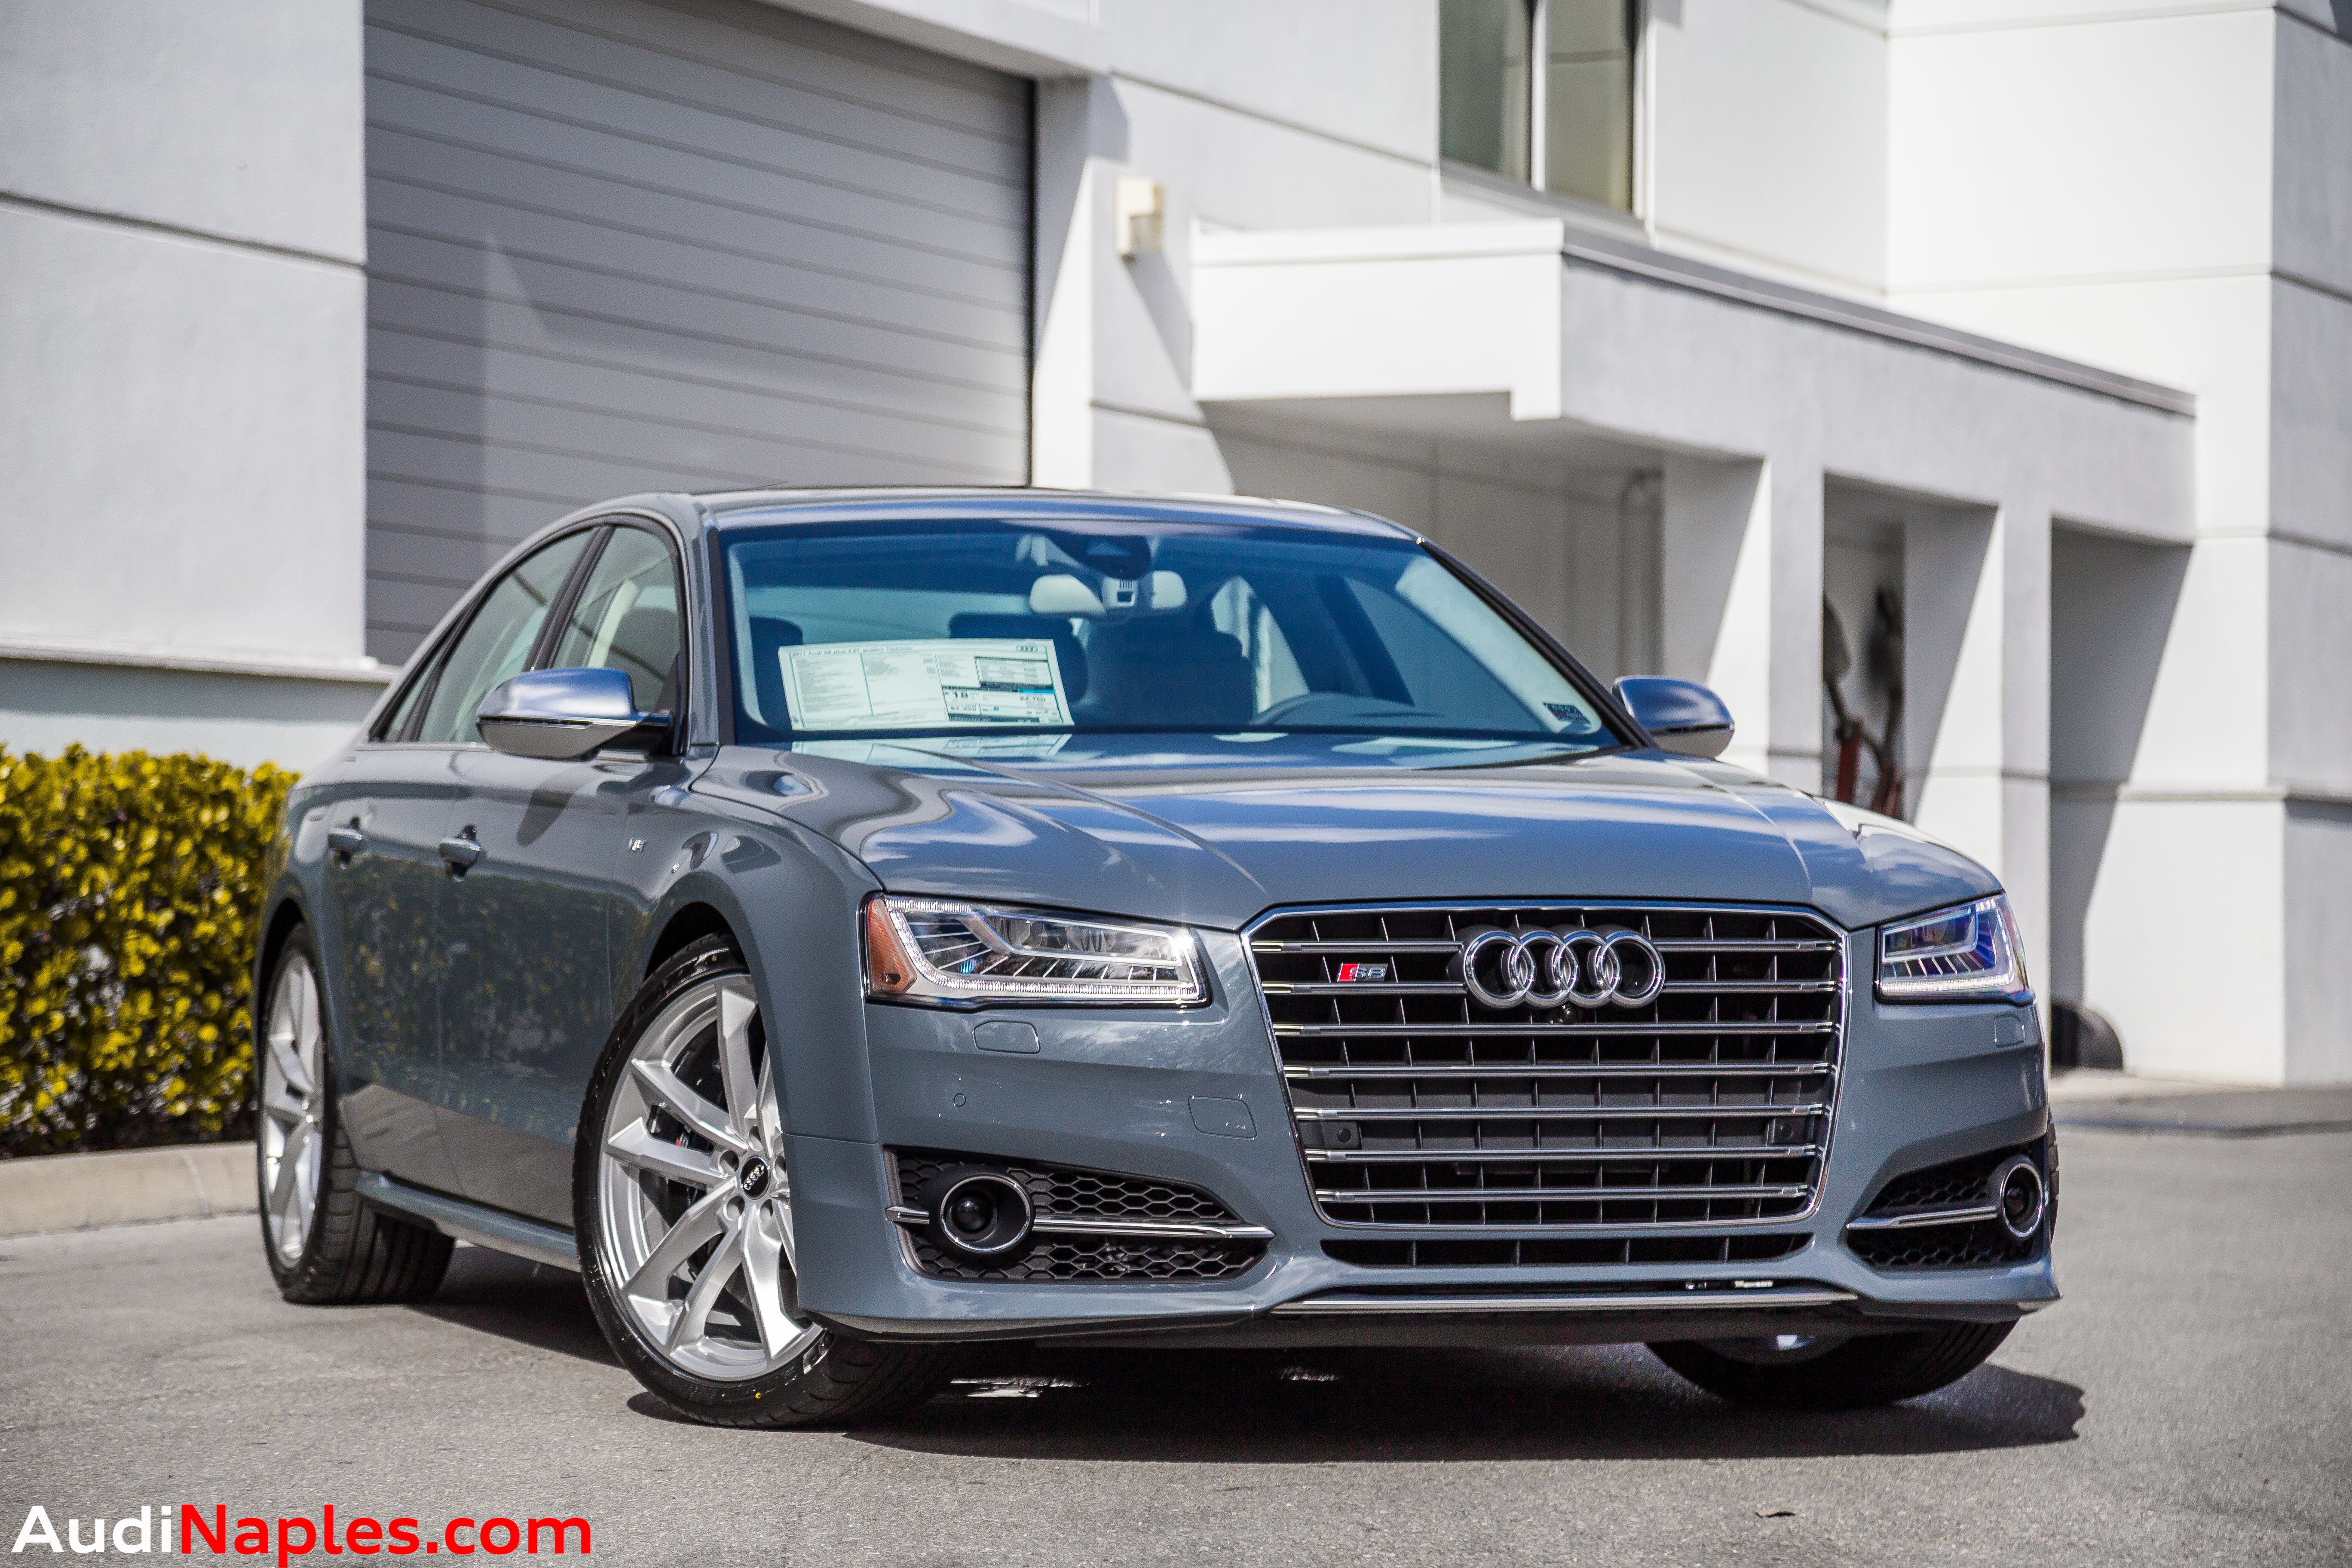 S8+ Graphite Blue Audi, Audi dealership, Used audi